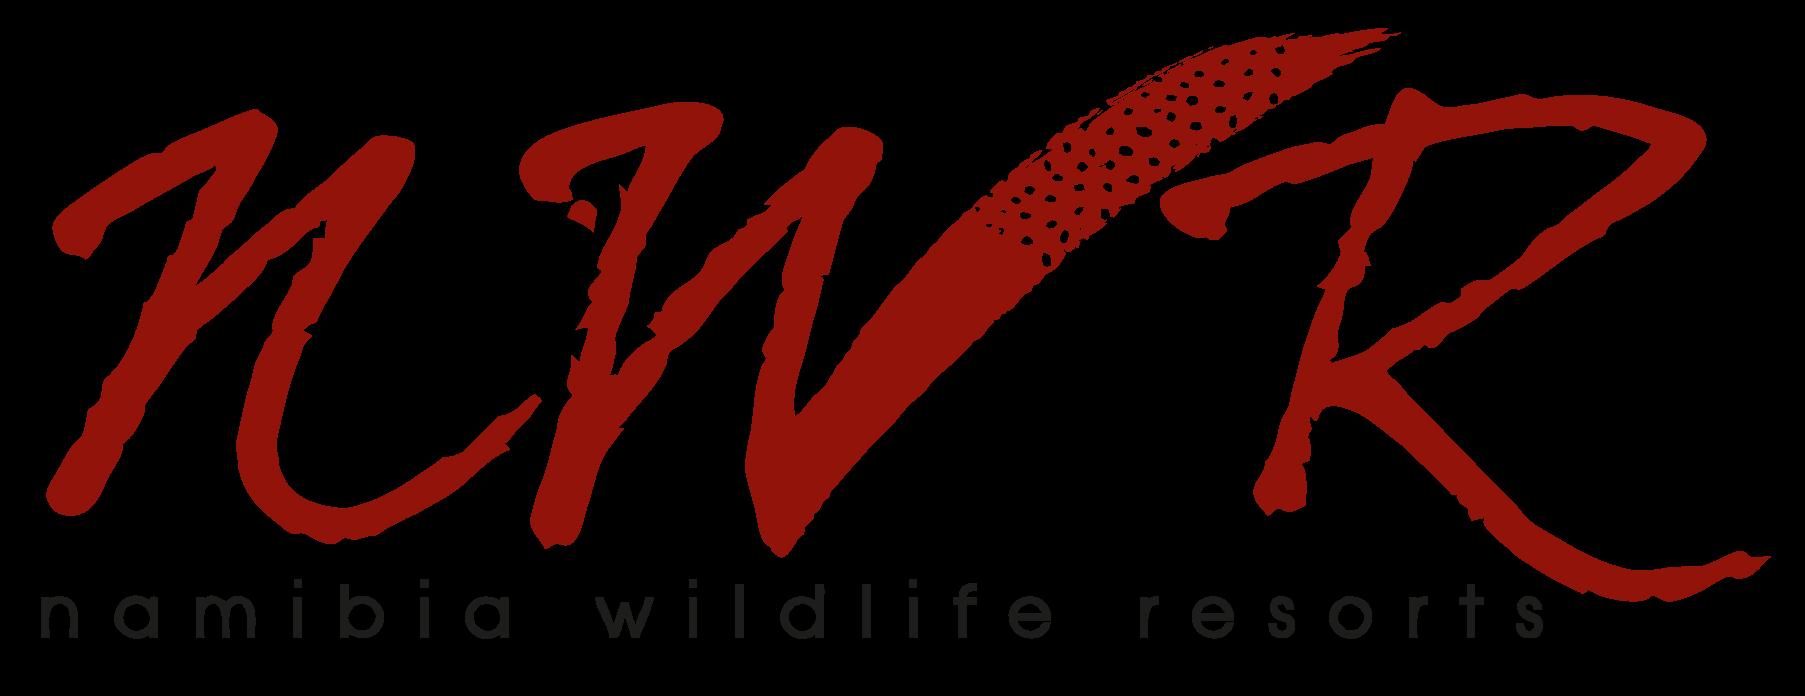 Namibia Wildlife Resorts